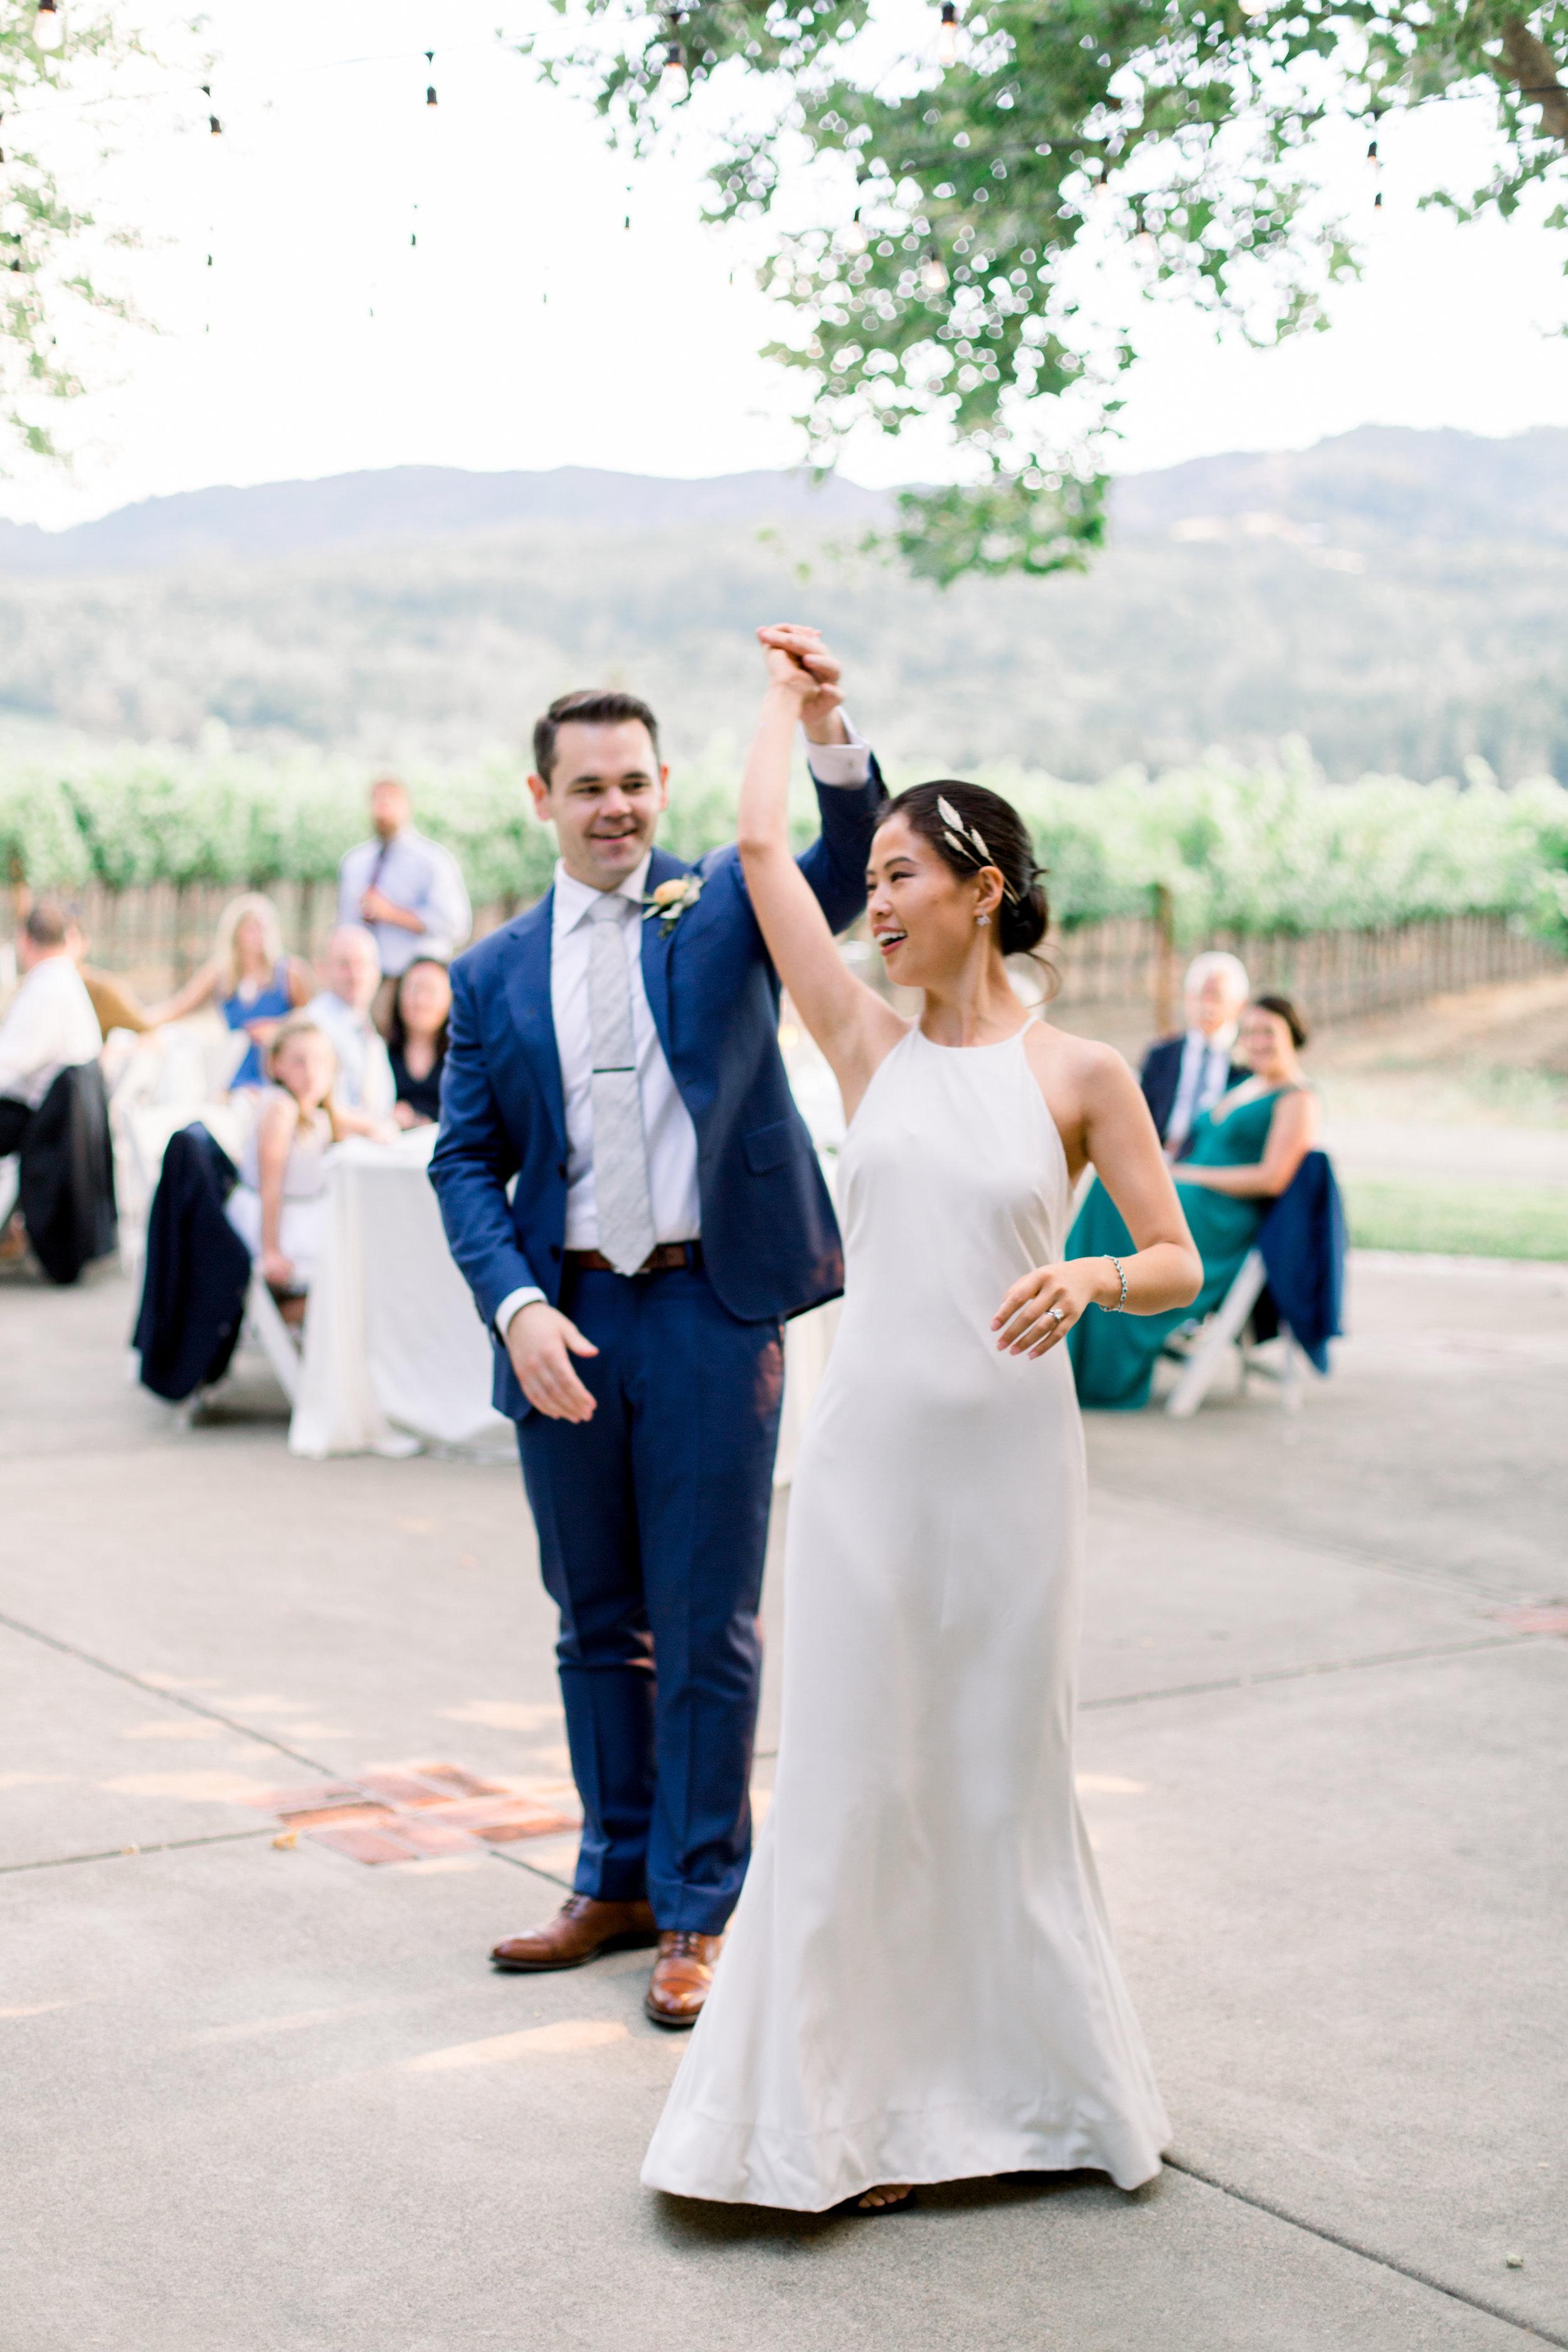 Harvest-inn-wedding-in-napa-california-328.jpg